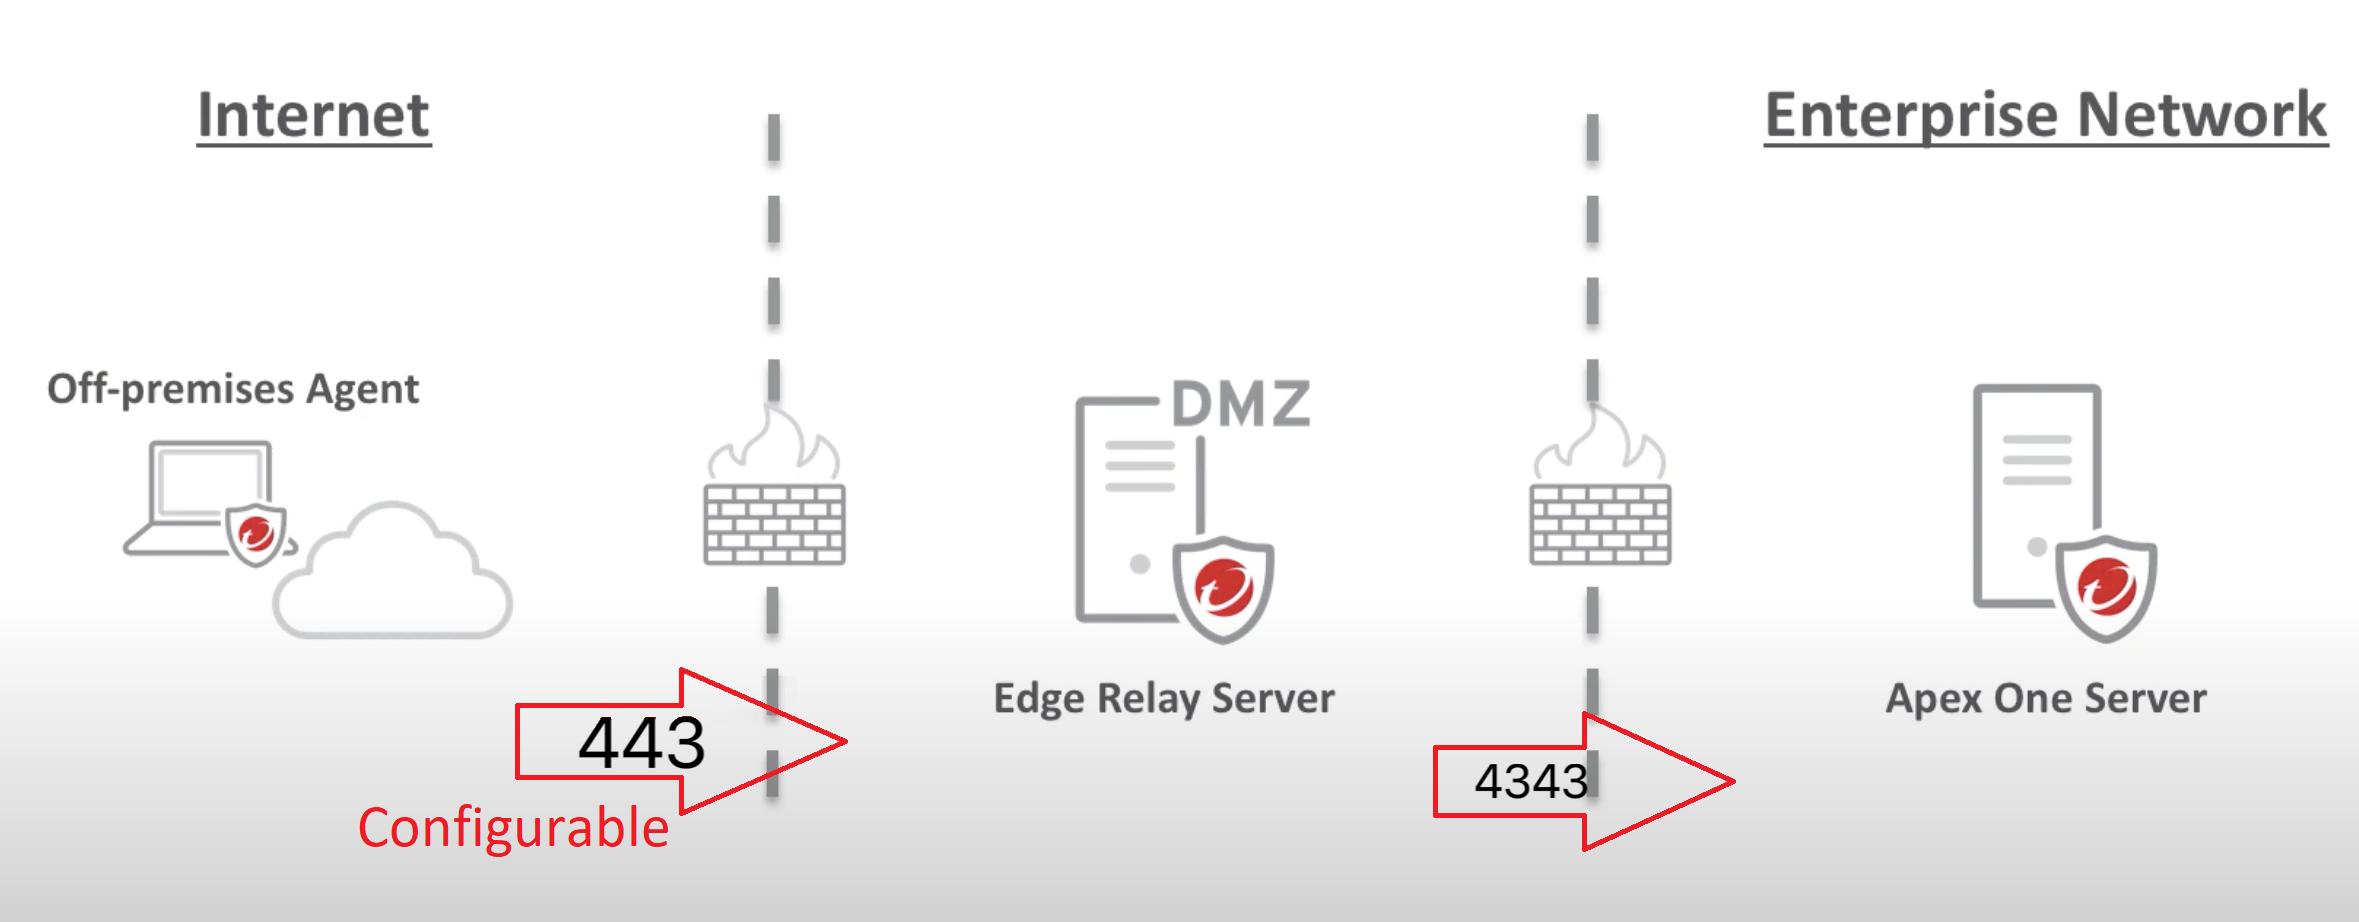 Edge Relay Server Off-Premise management